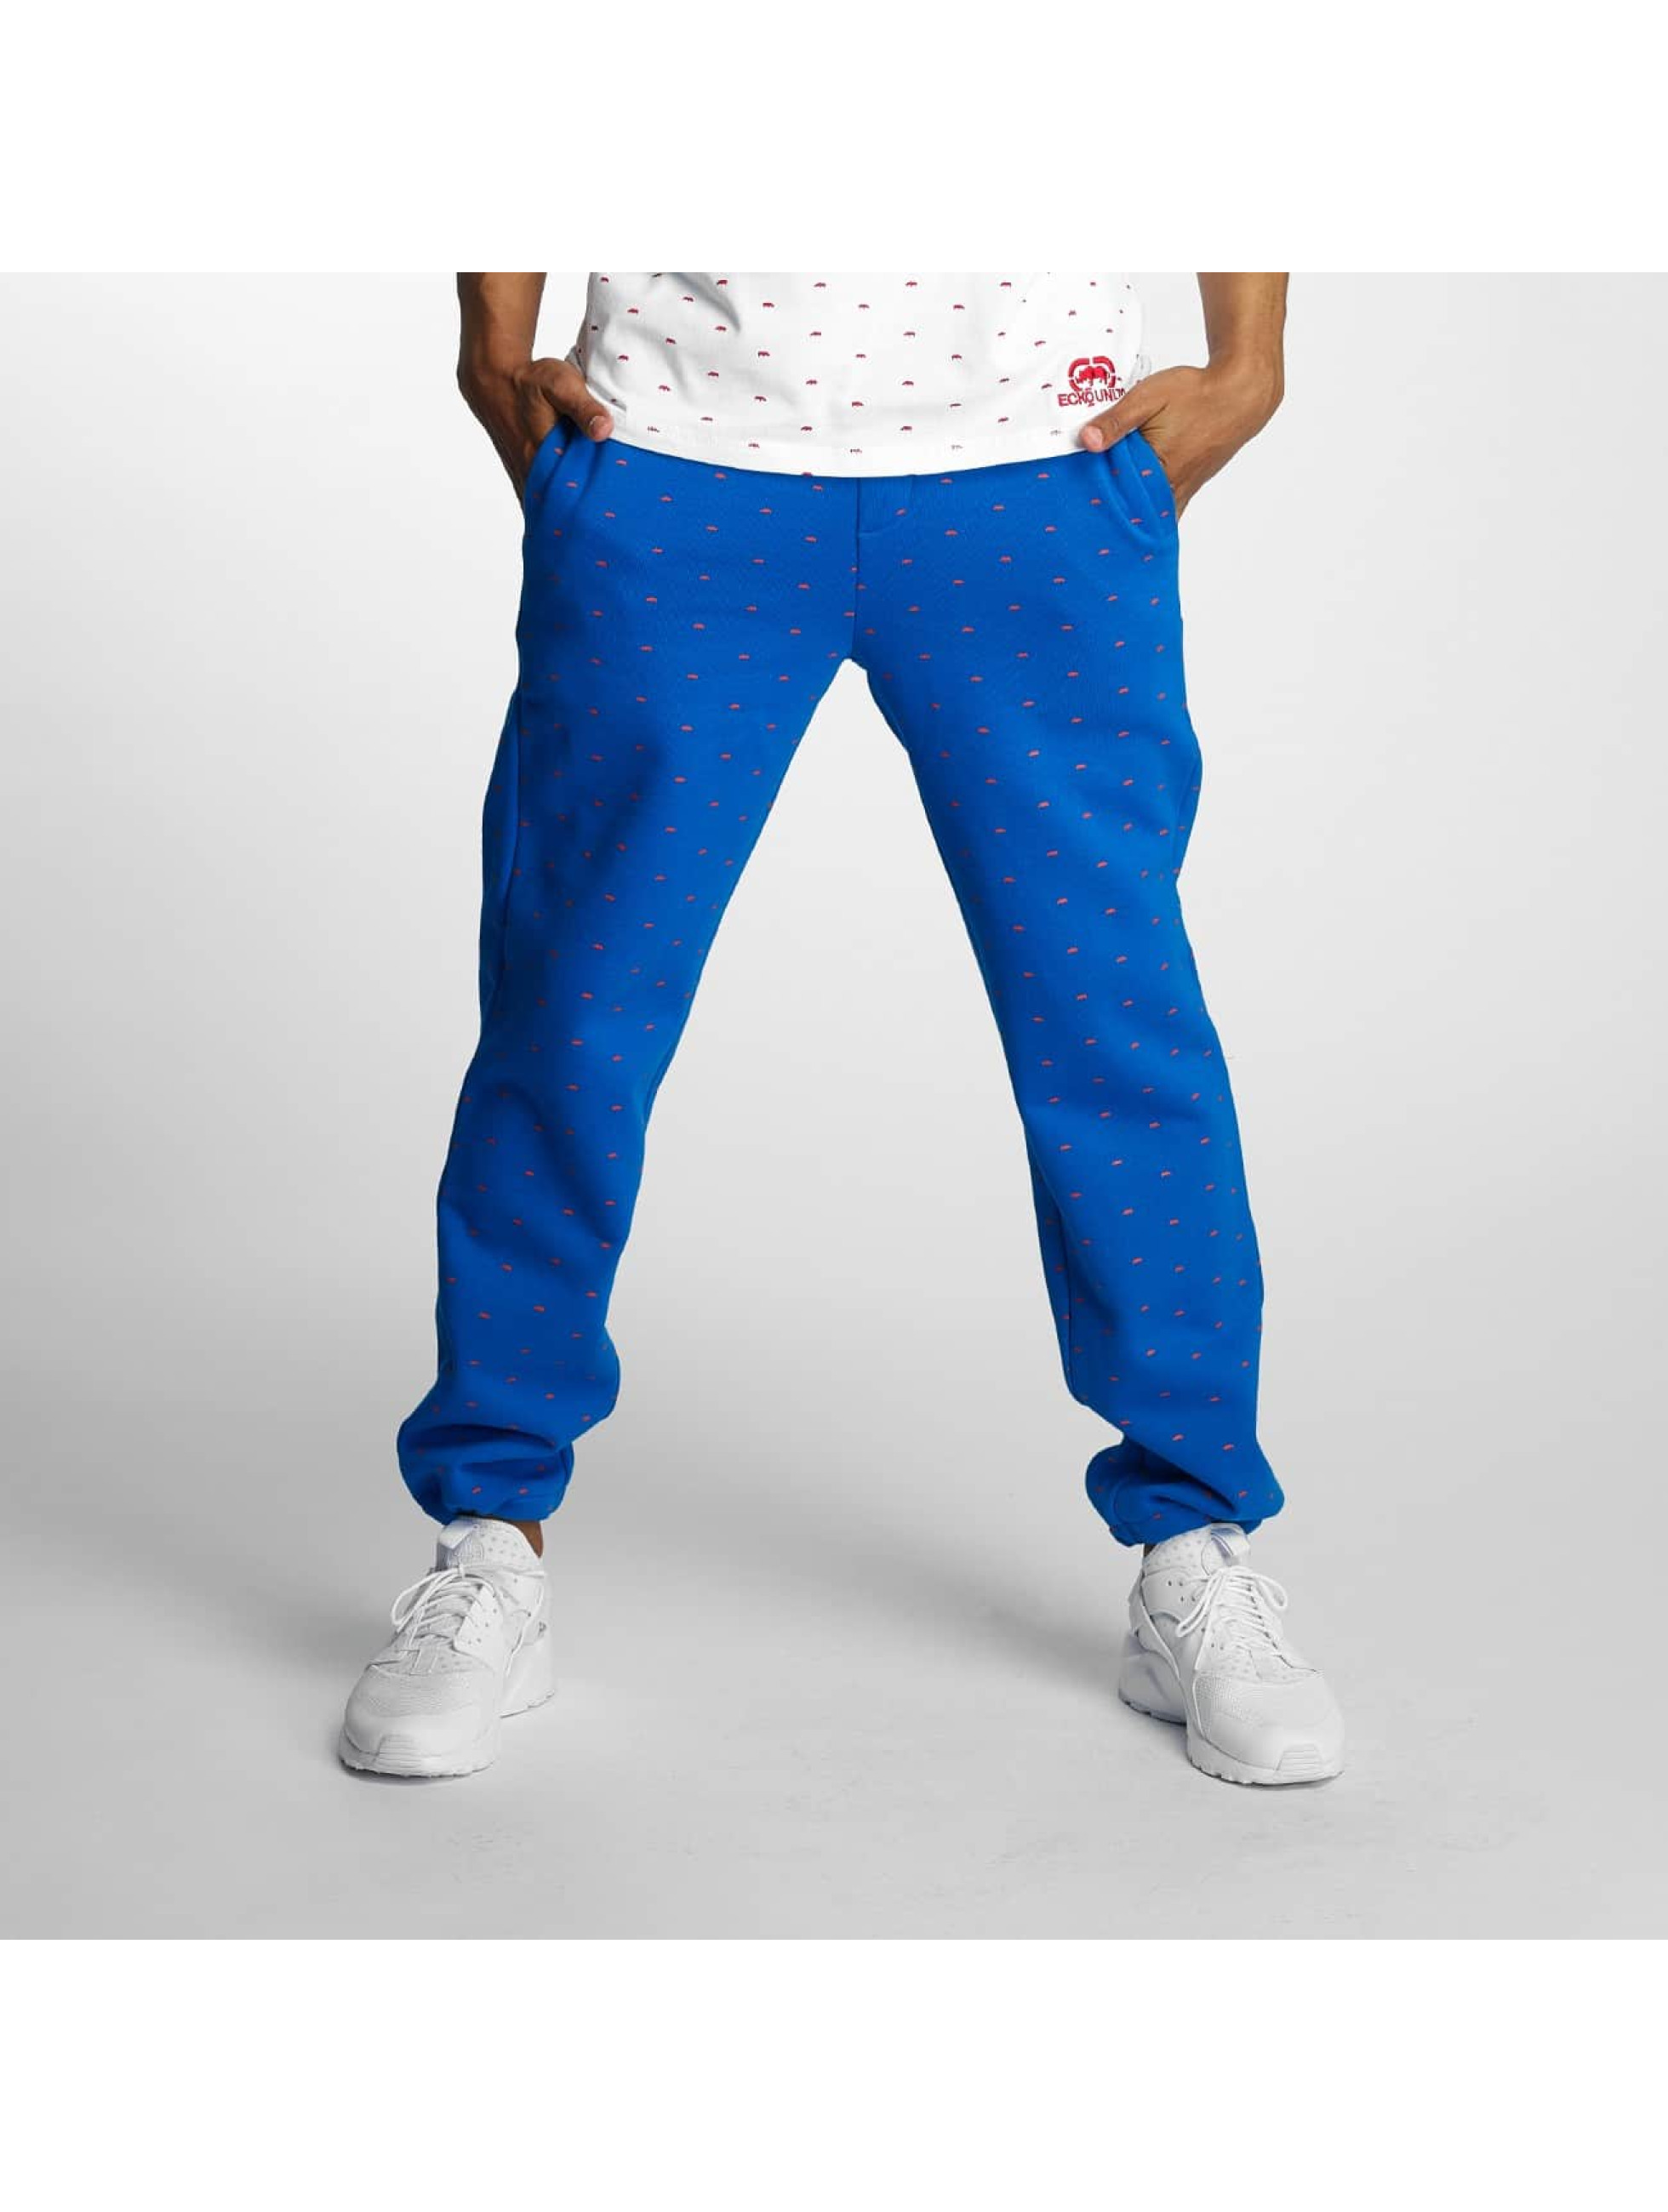 Ecko Unltd. Männer Jogginghose Swecko in blau